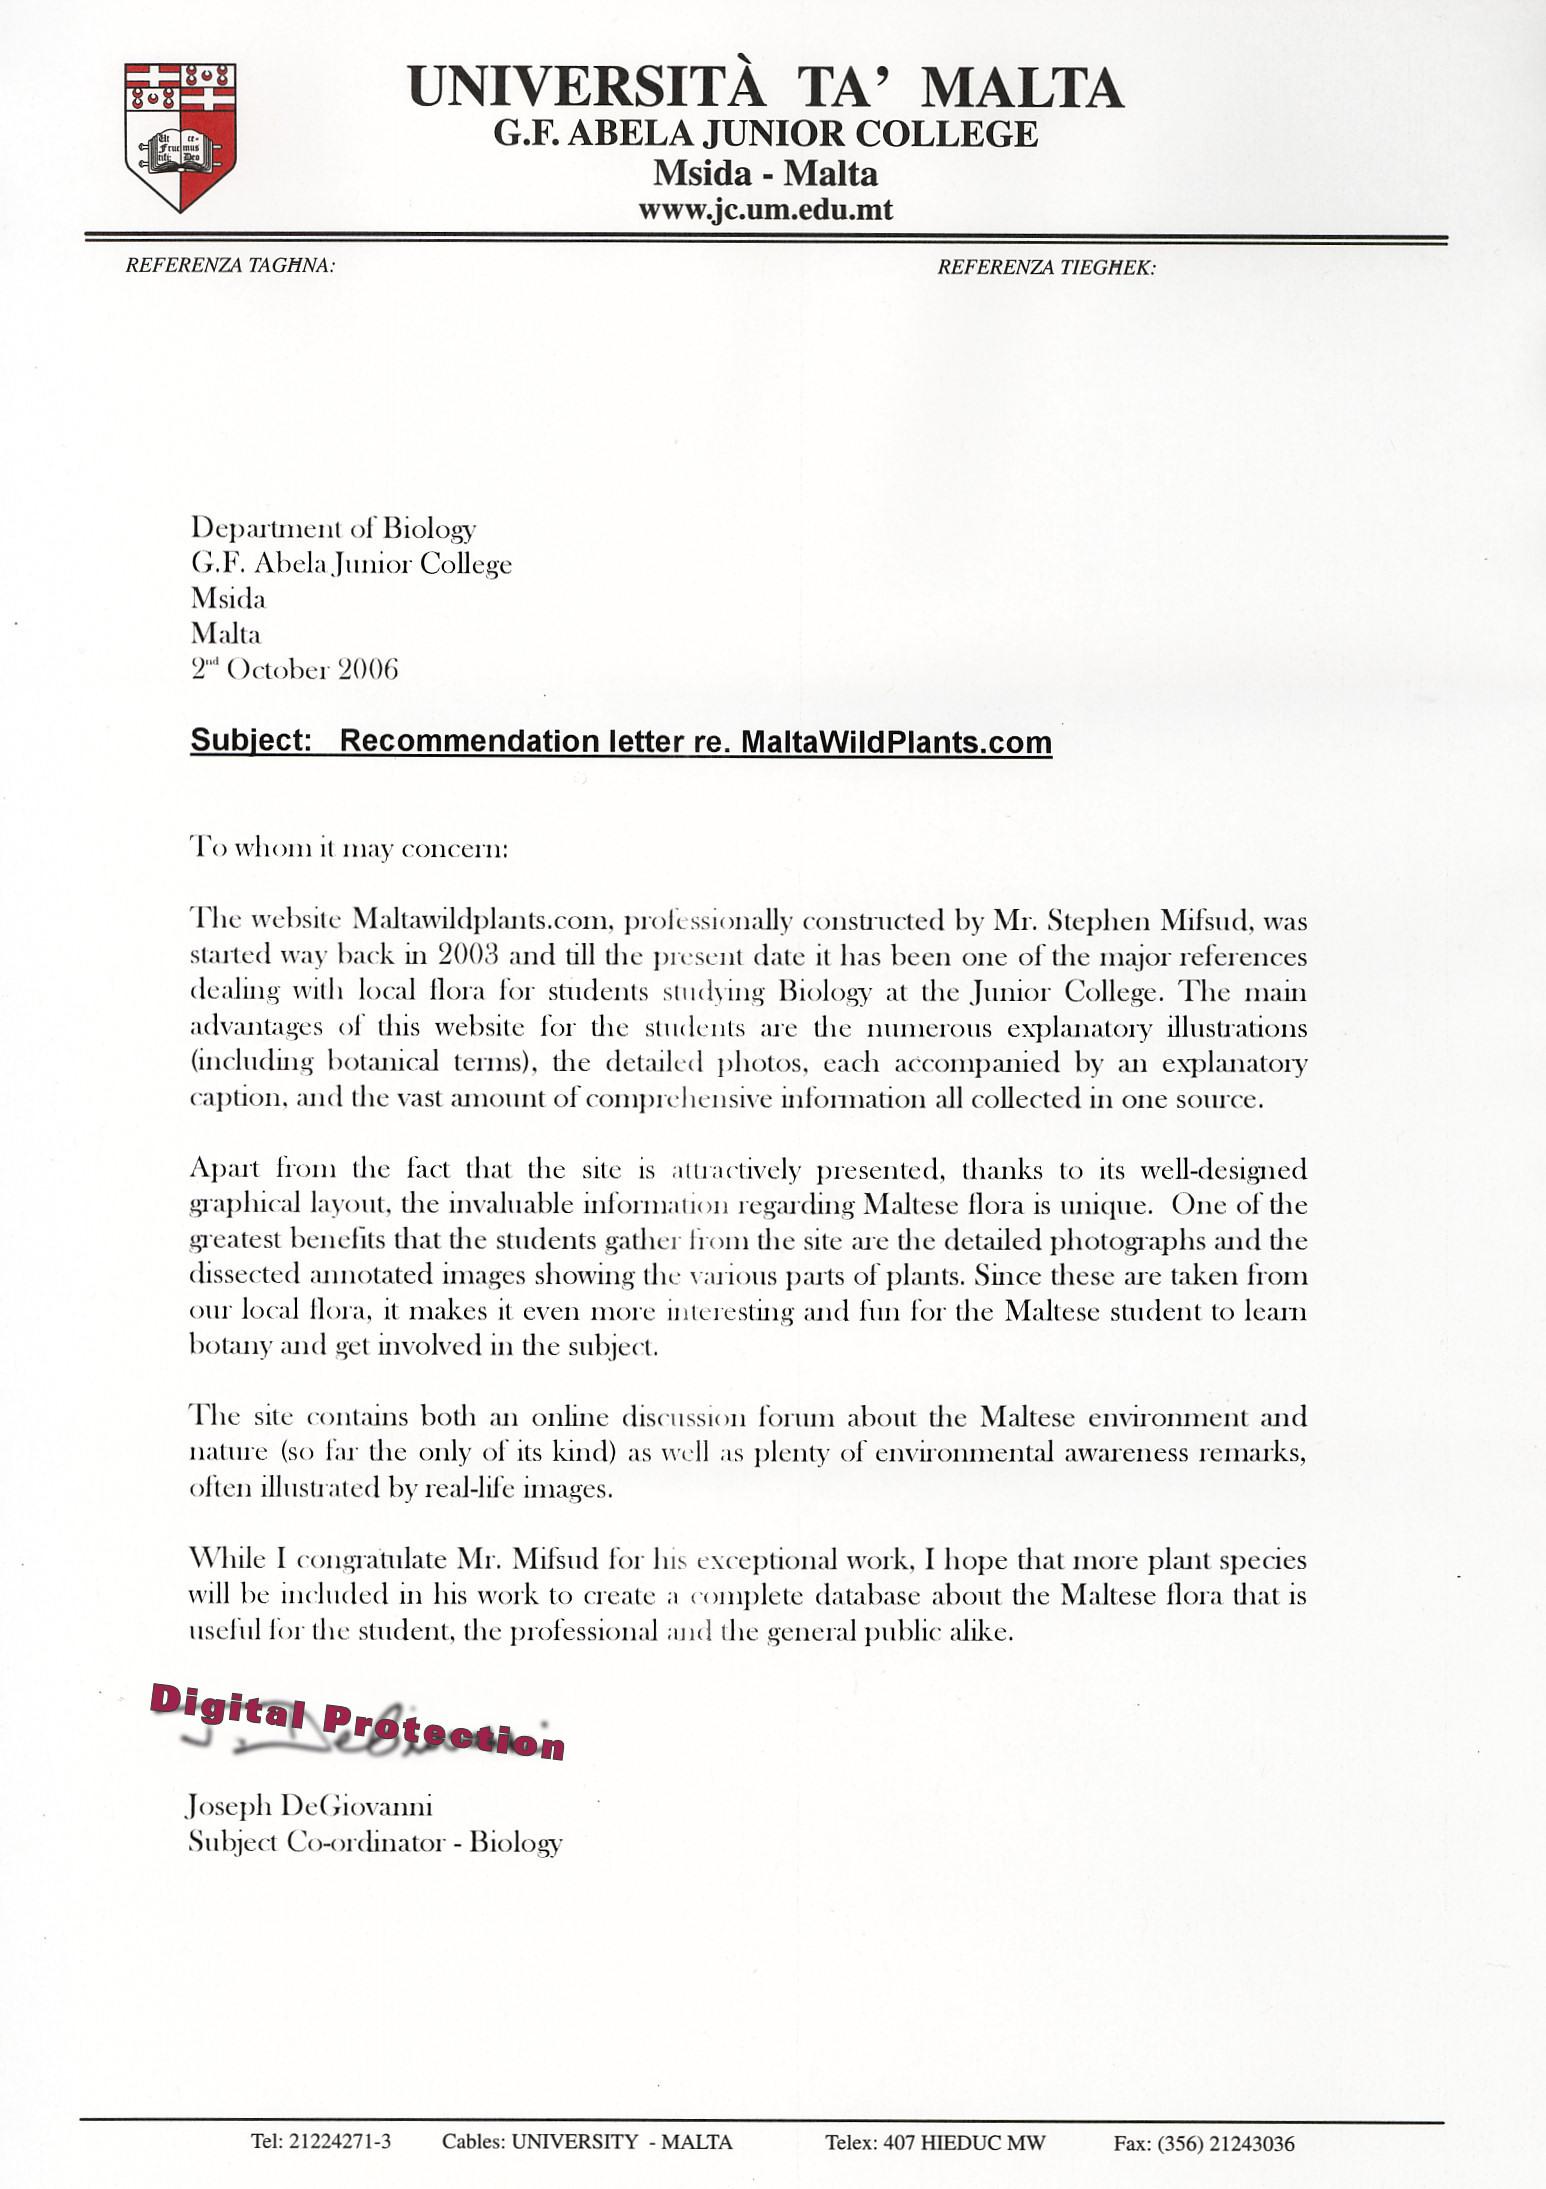 Sample letter of support for promotion to full professor for Teaching dossier template